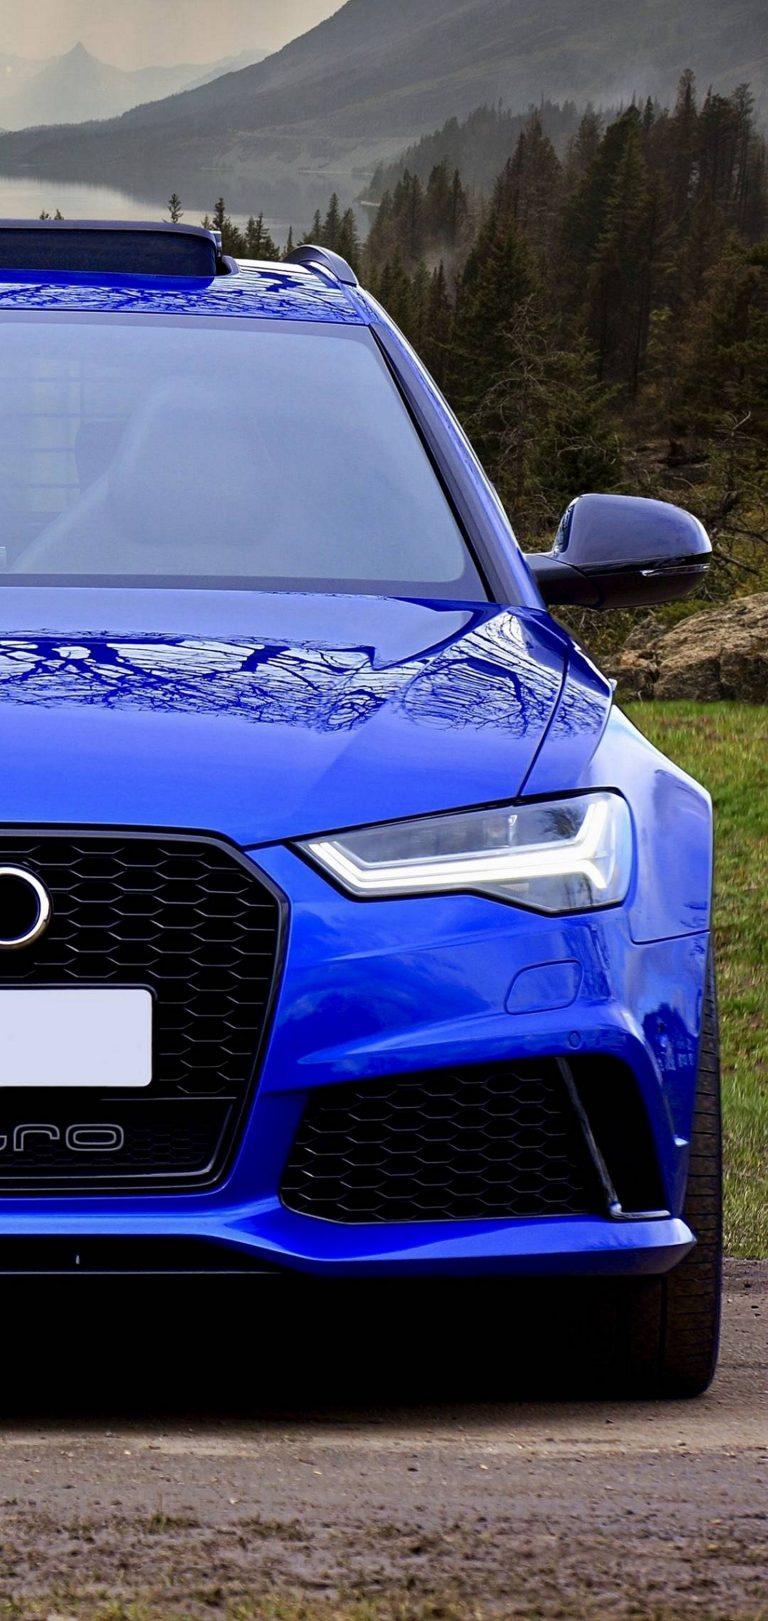 Blue Car Side Wallpaper 1440x3040 768x1621